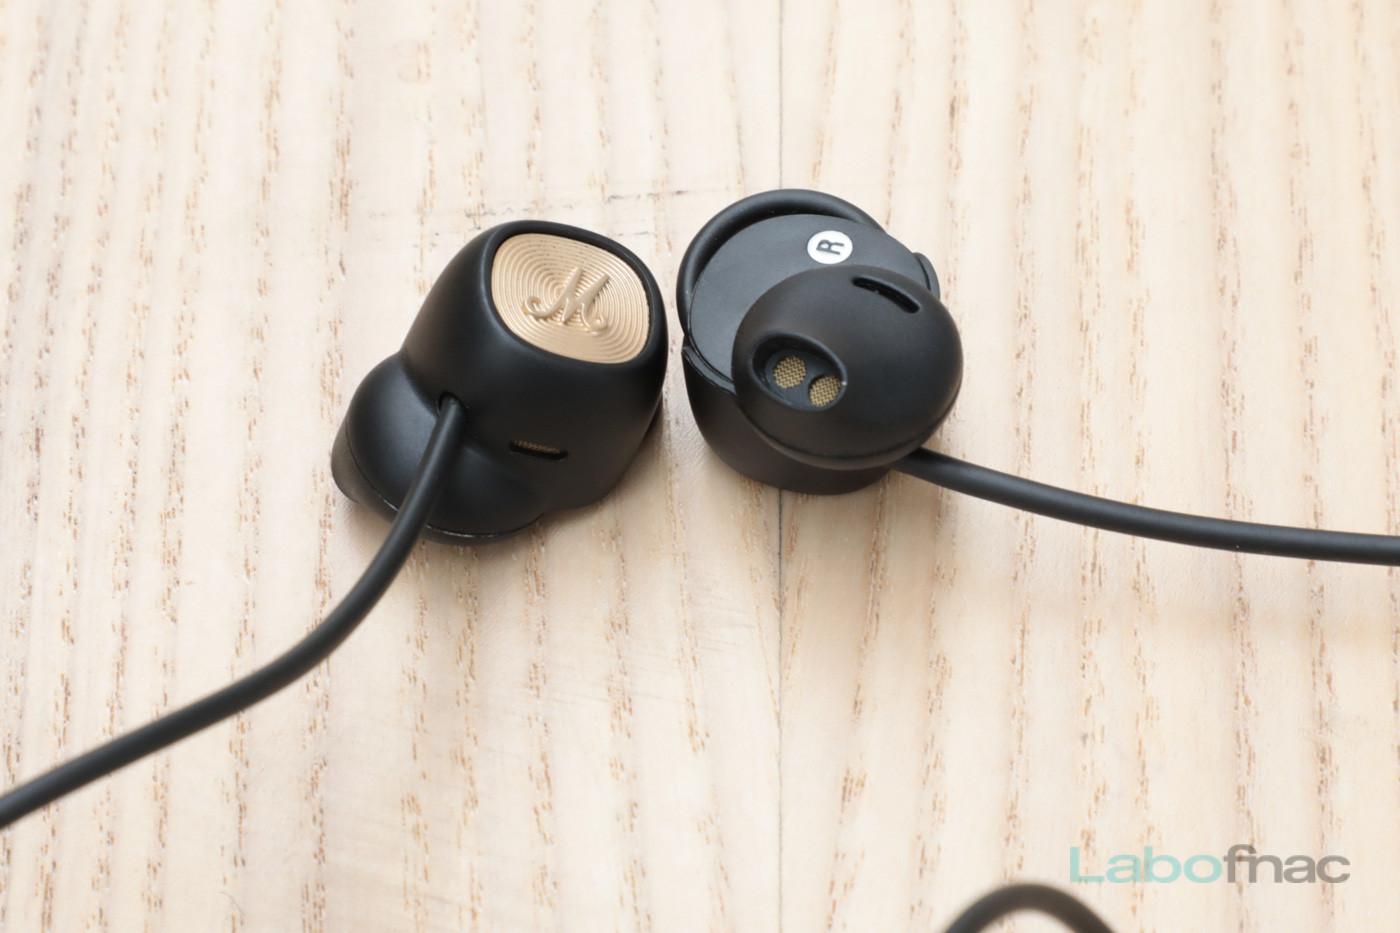 Test des Marshall Minor II Bluetooth : pratiques, mais avec